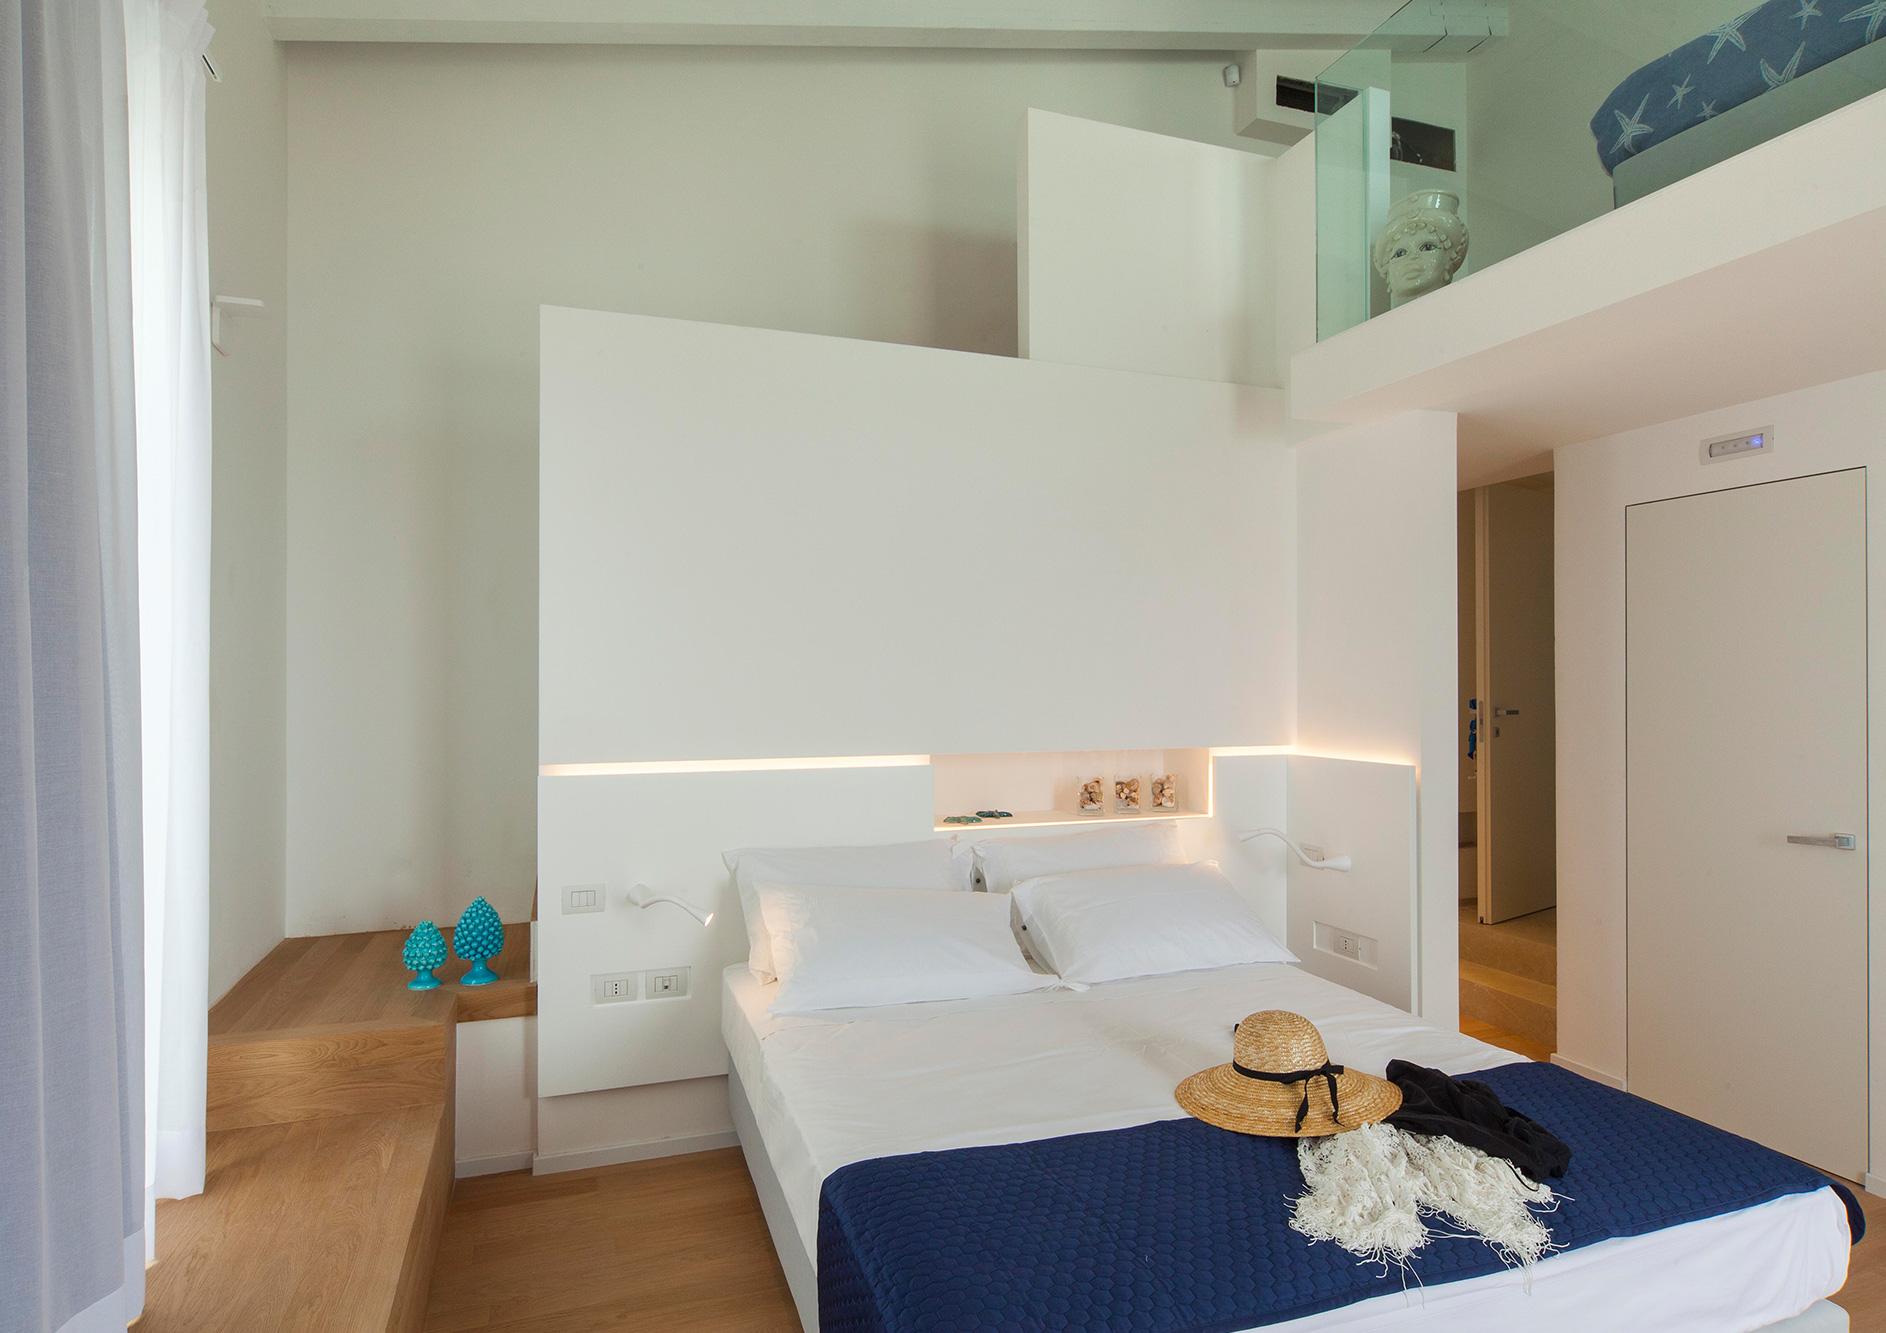 junior-suite-con-terrazzo-vista-mare-9